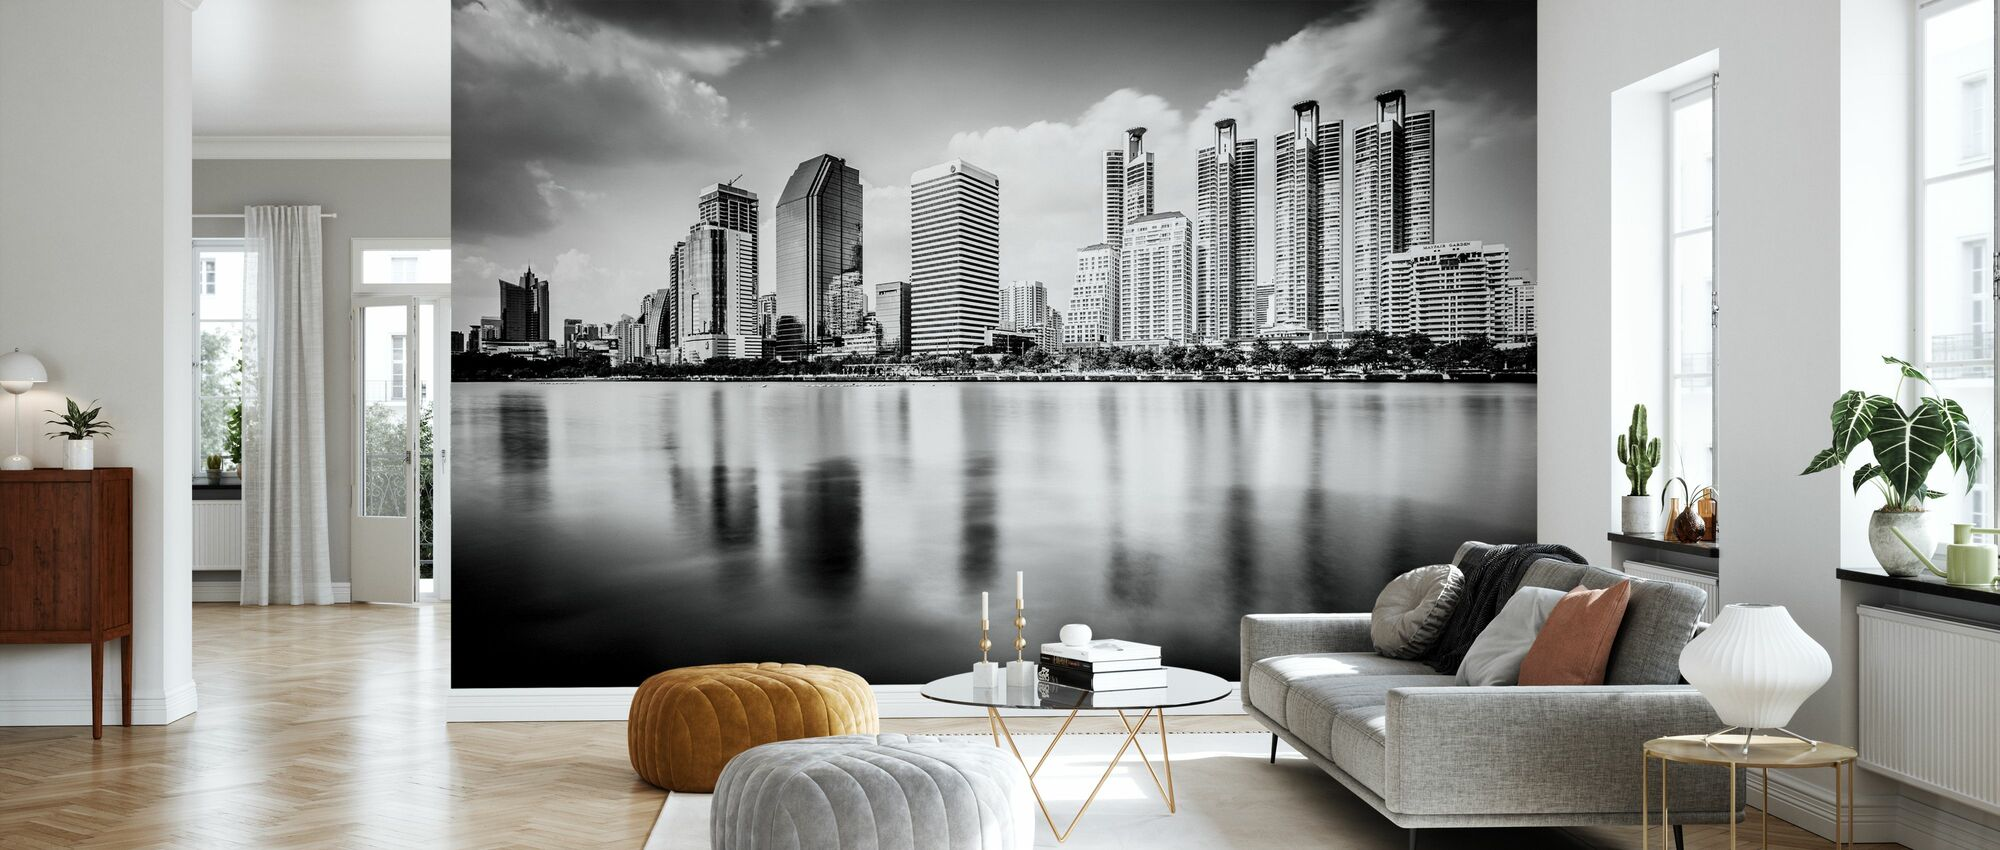 Bangkok Skyline - Tapet - Stue